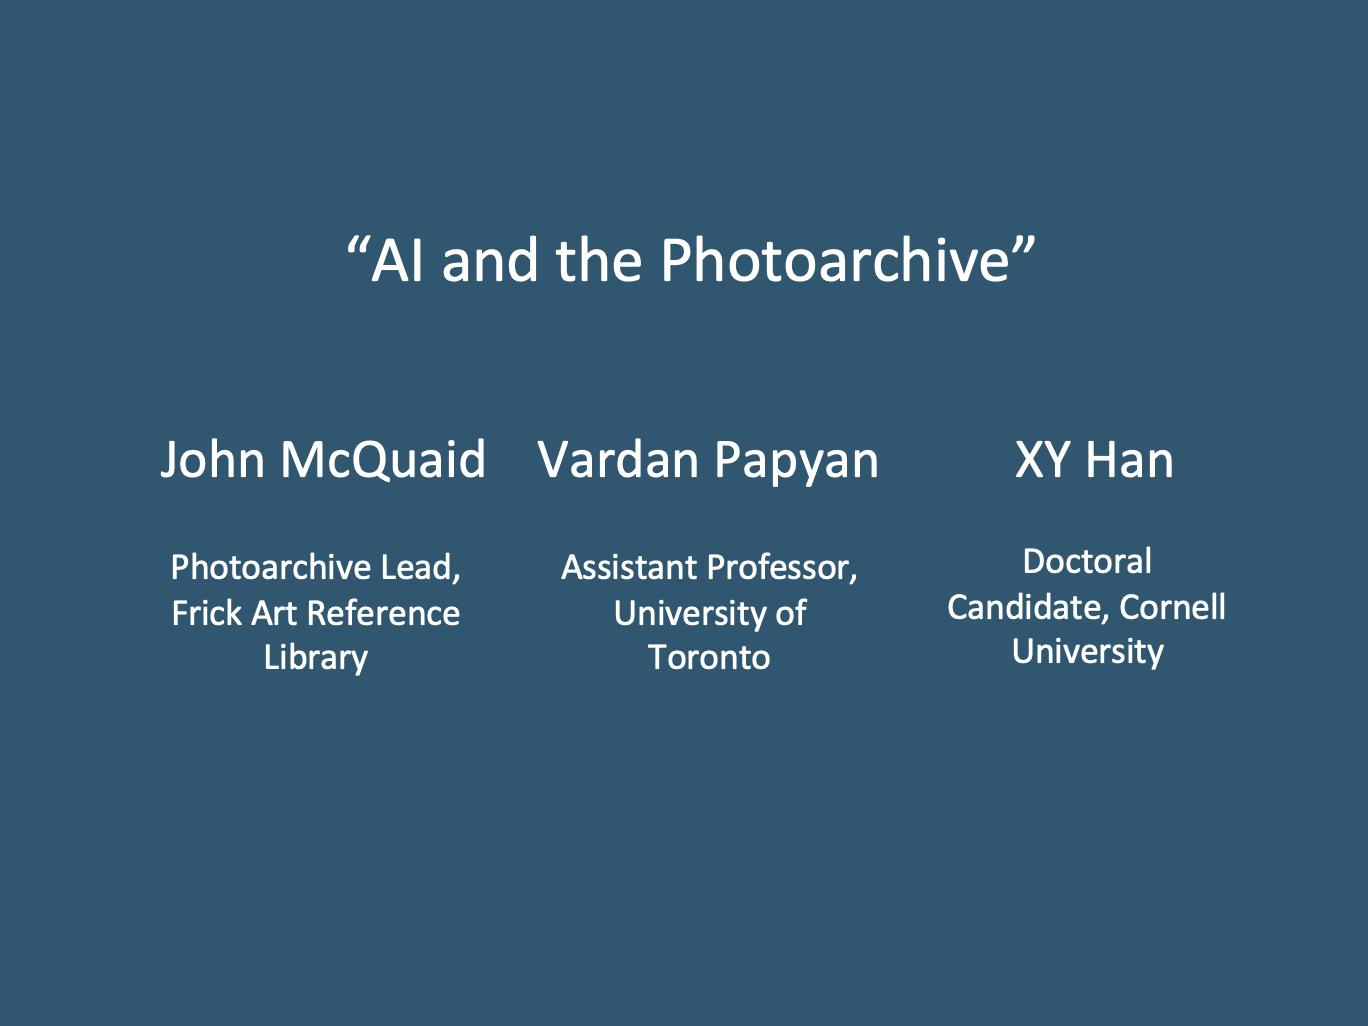 "Workshop 1: John McQuaid, Vardan Papyan, and XY Han, ""AI and the Photoarchive"""